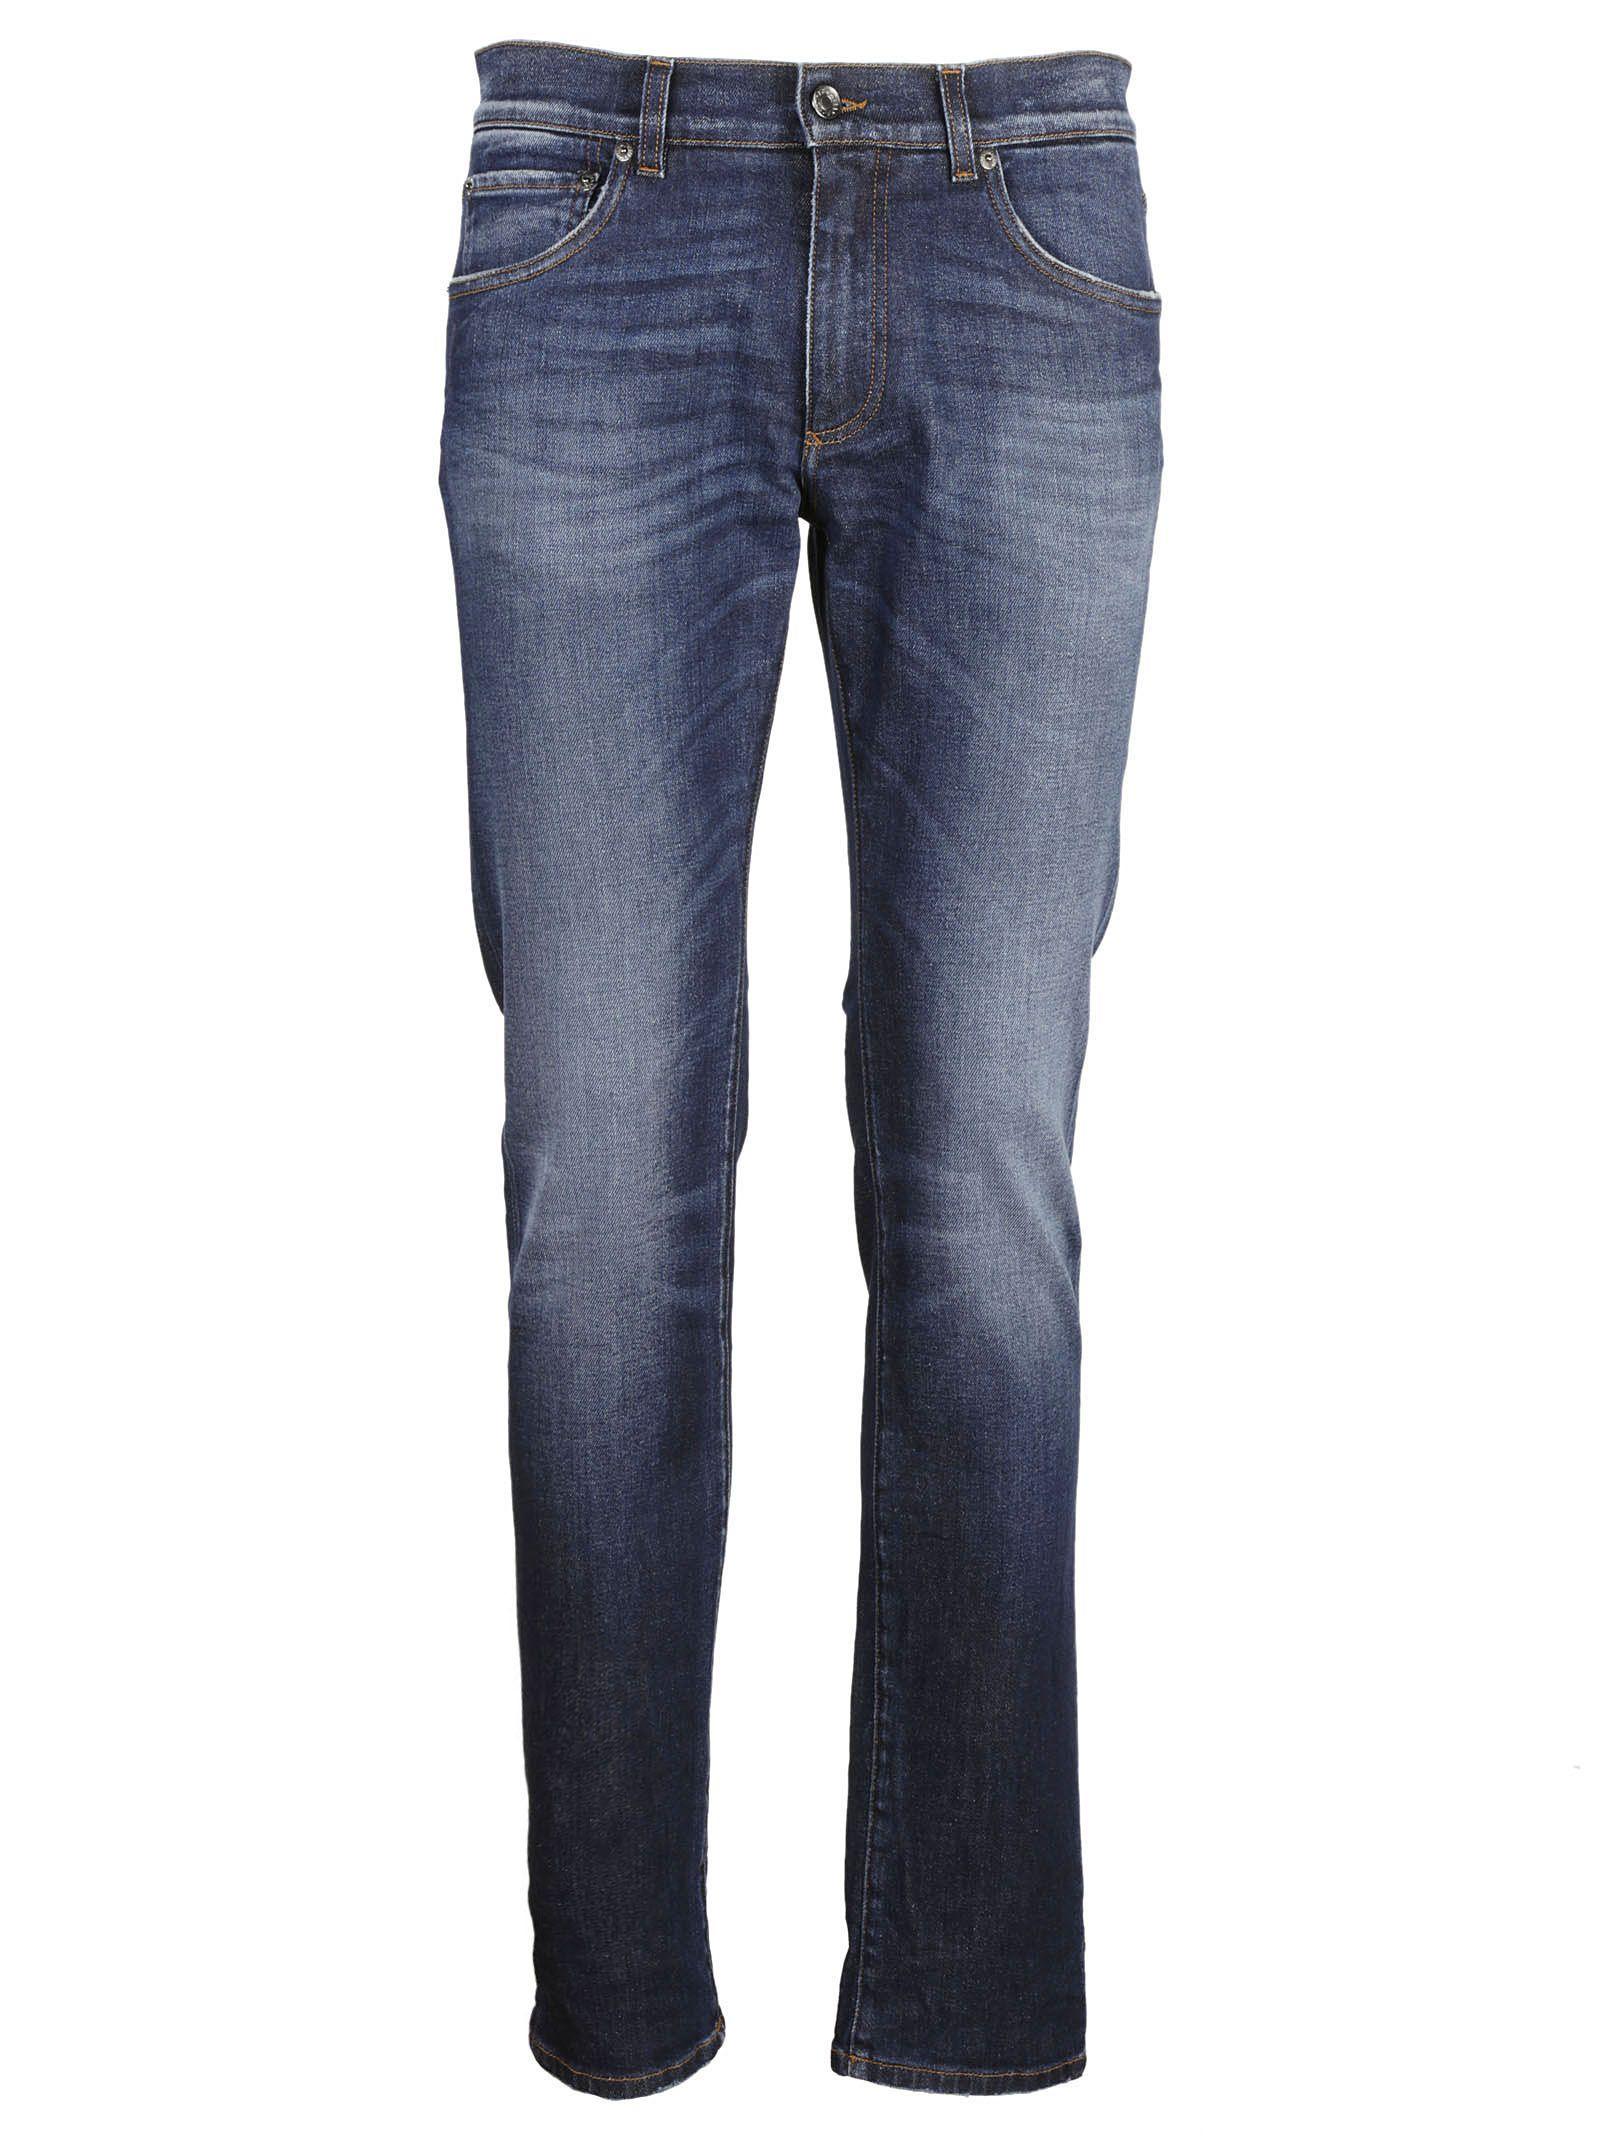 Dolce & Gabbana Leather Applique Jeans